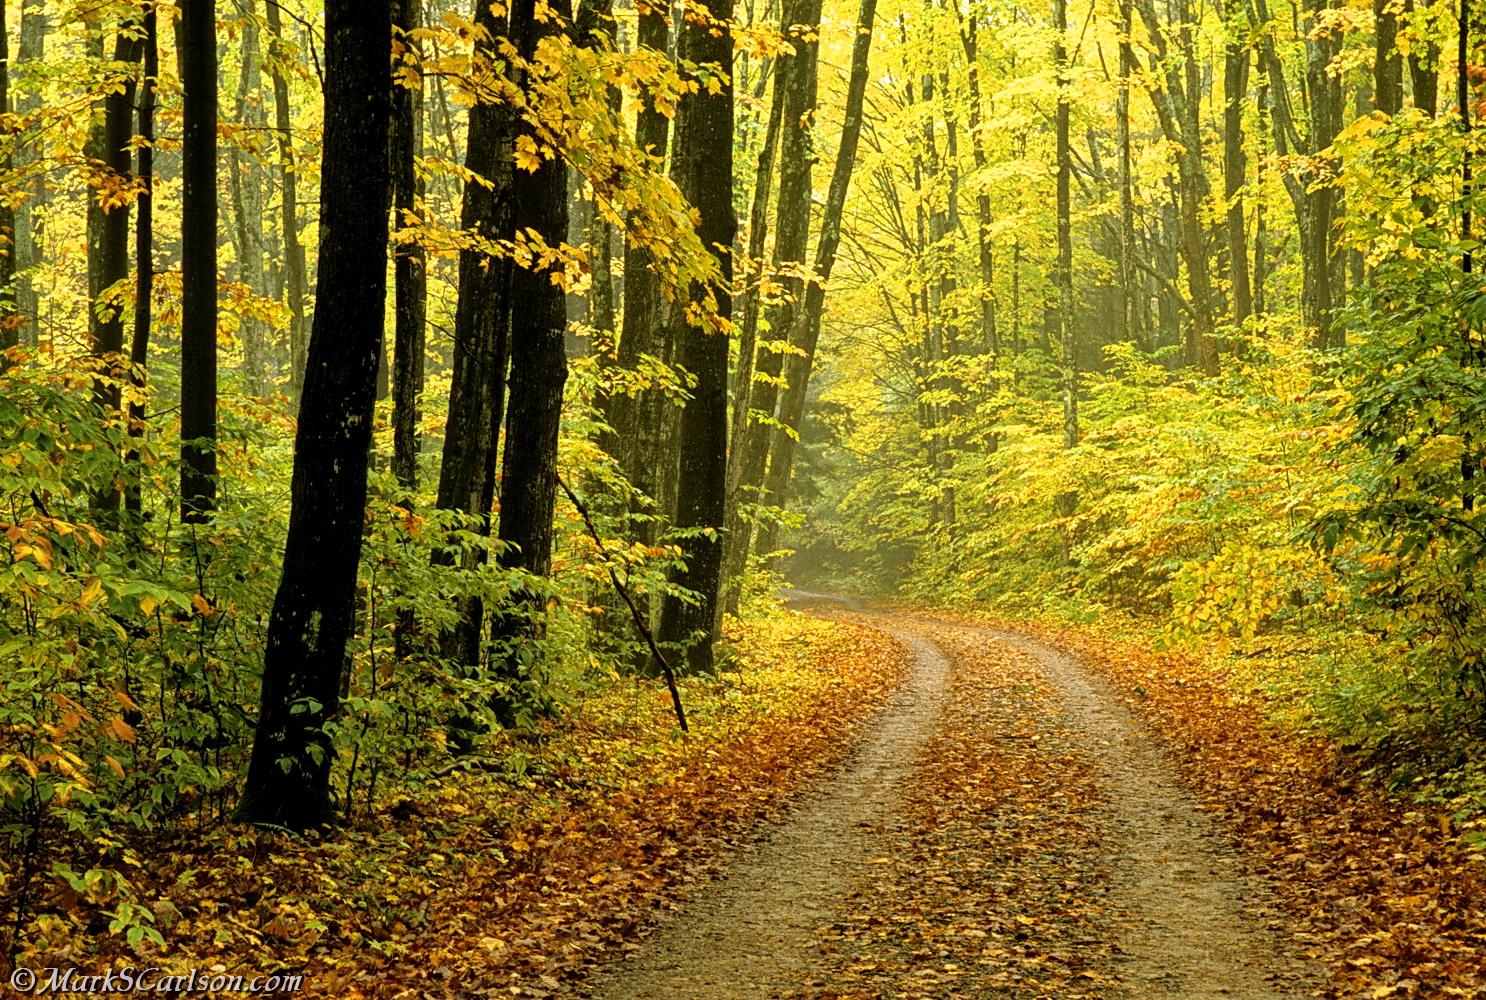 Two-track road thru autumn woods in light fog_2_resize.jpg